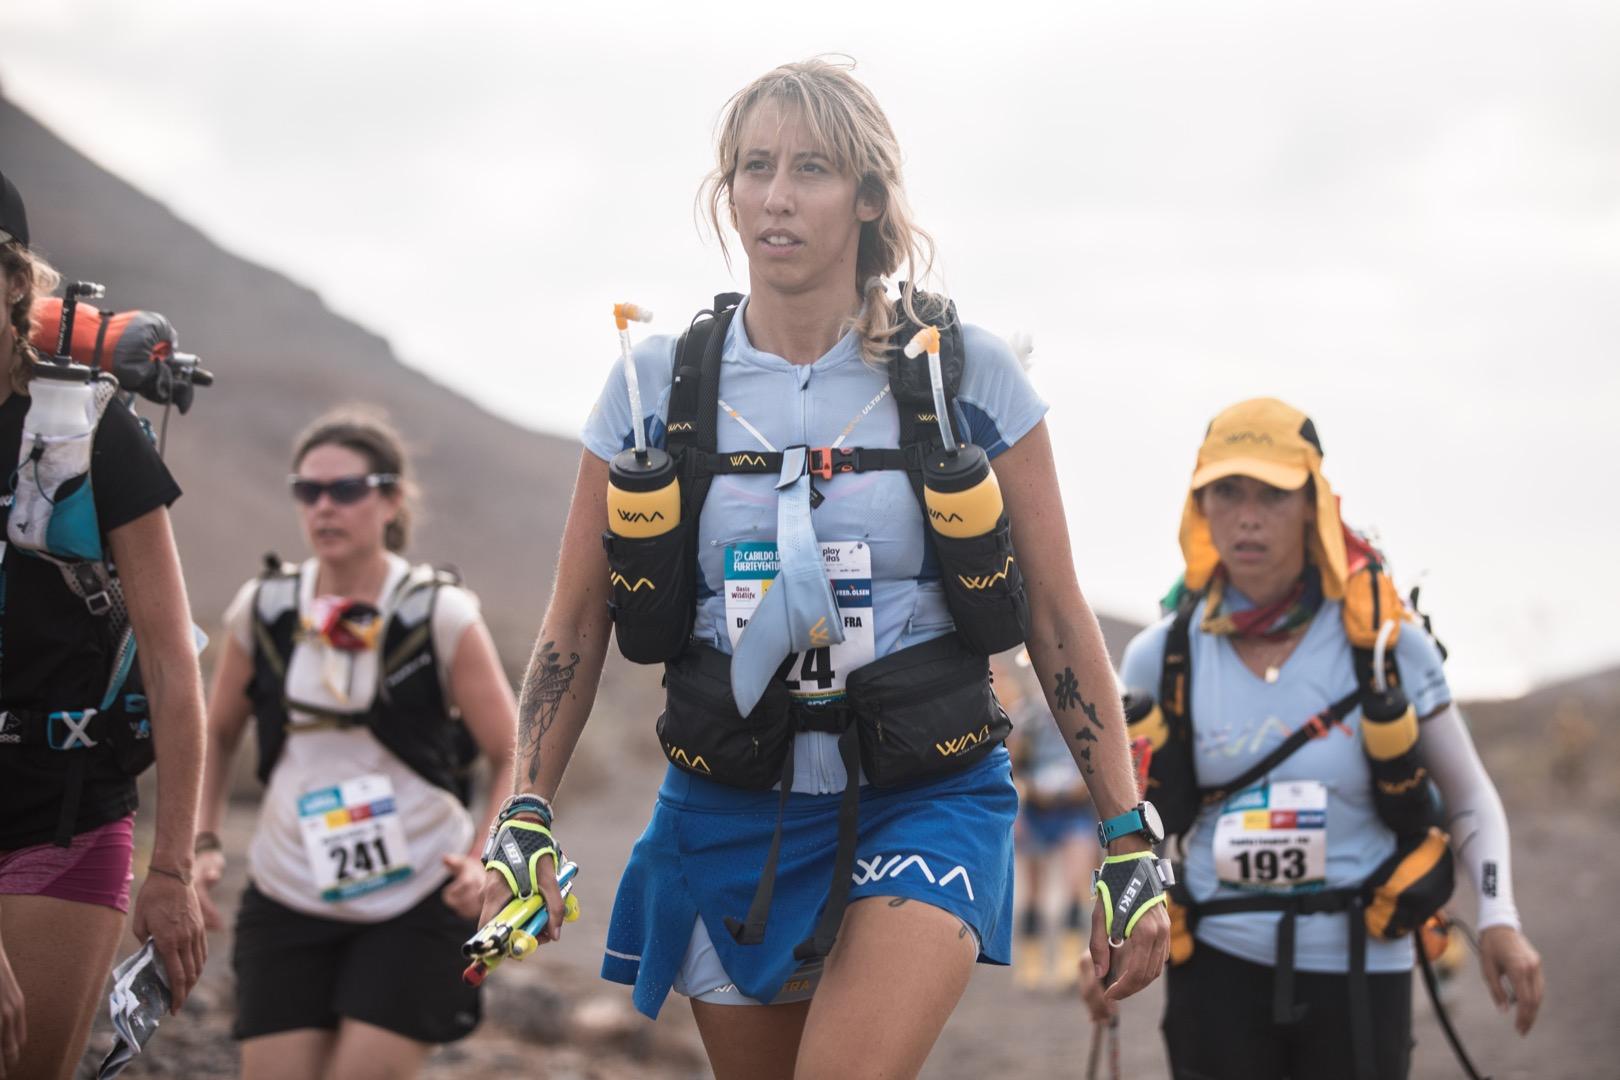 Crónica Etapa 3 Half Marathon des Sables Fuerteventura 2019